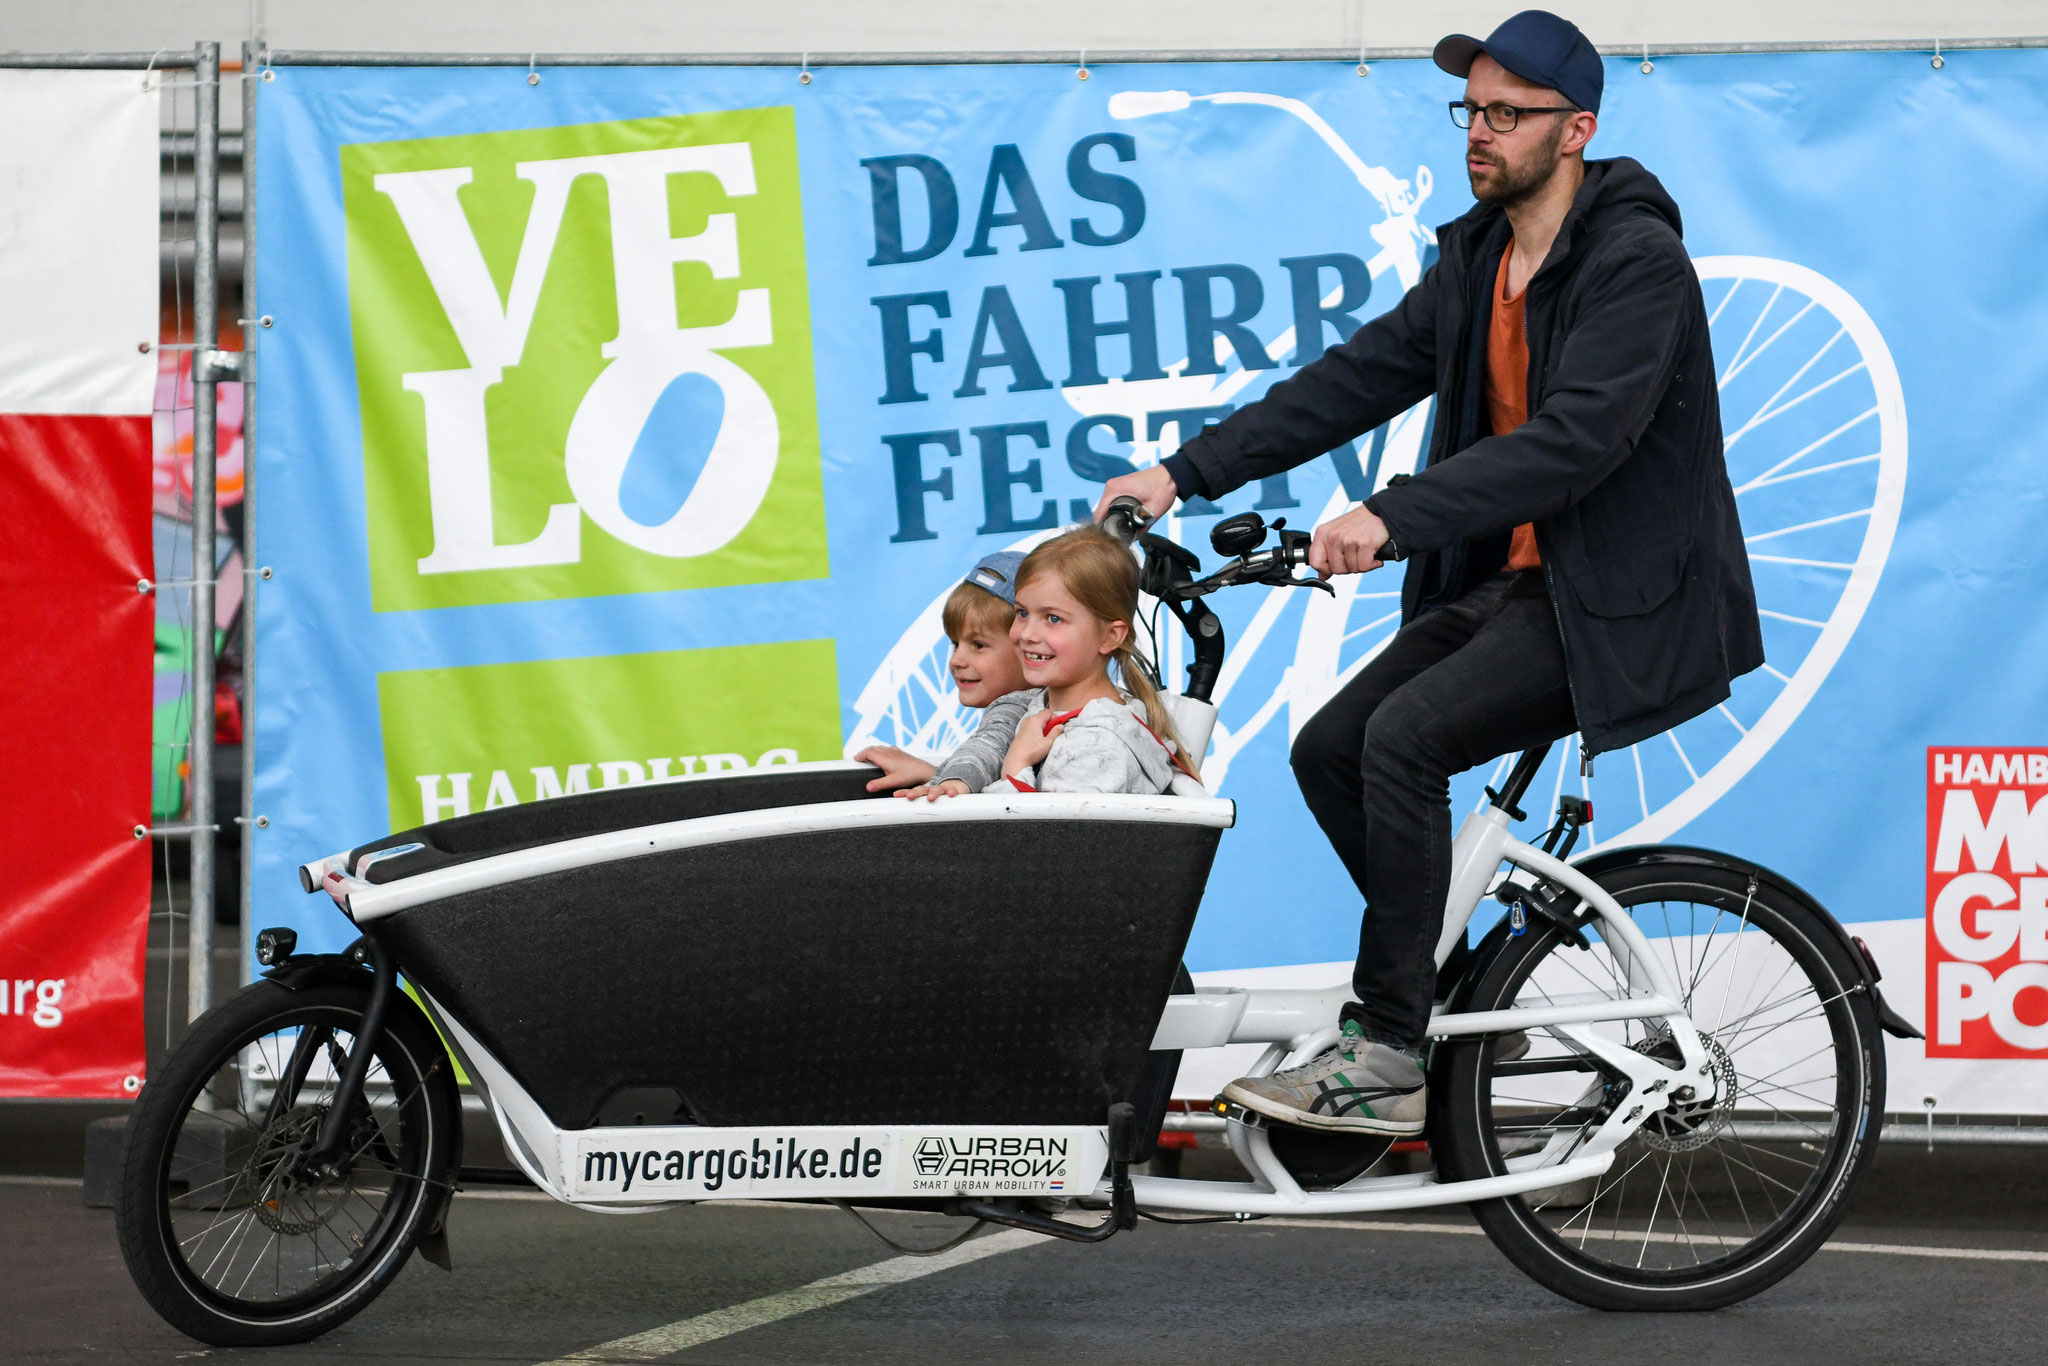 VELOHamburg - 18.-19.05.2019 - Rindermarkthalle St. Pauli // © Fotograf Thomas Panzau